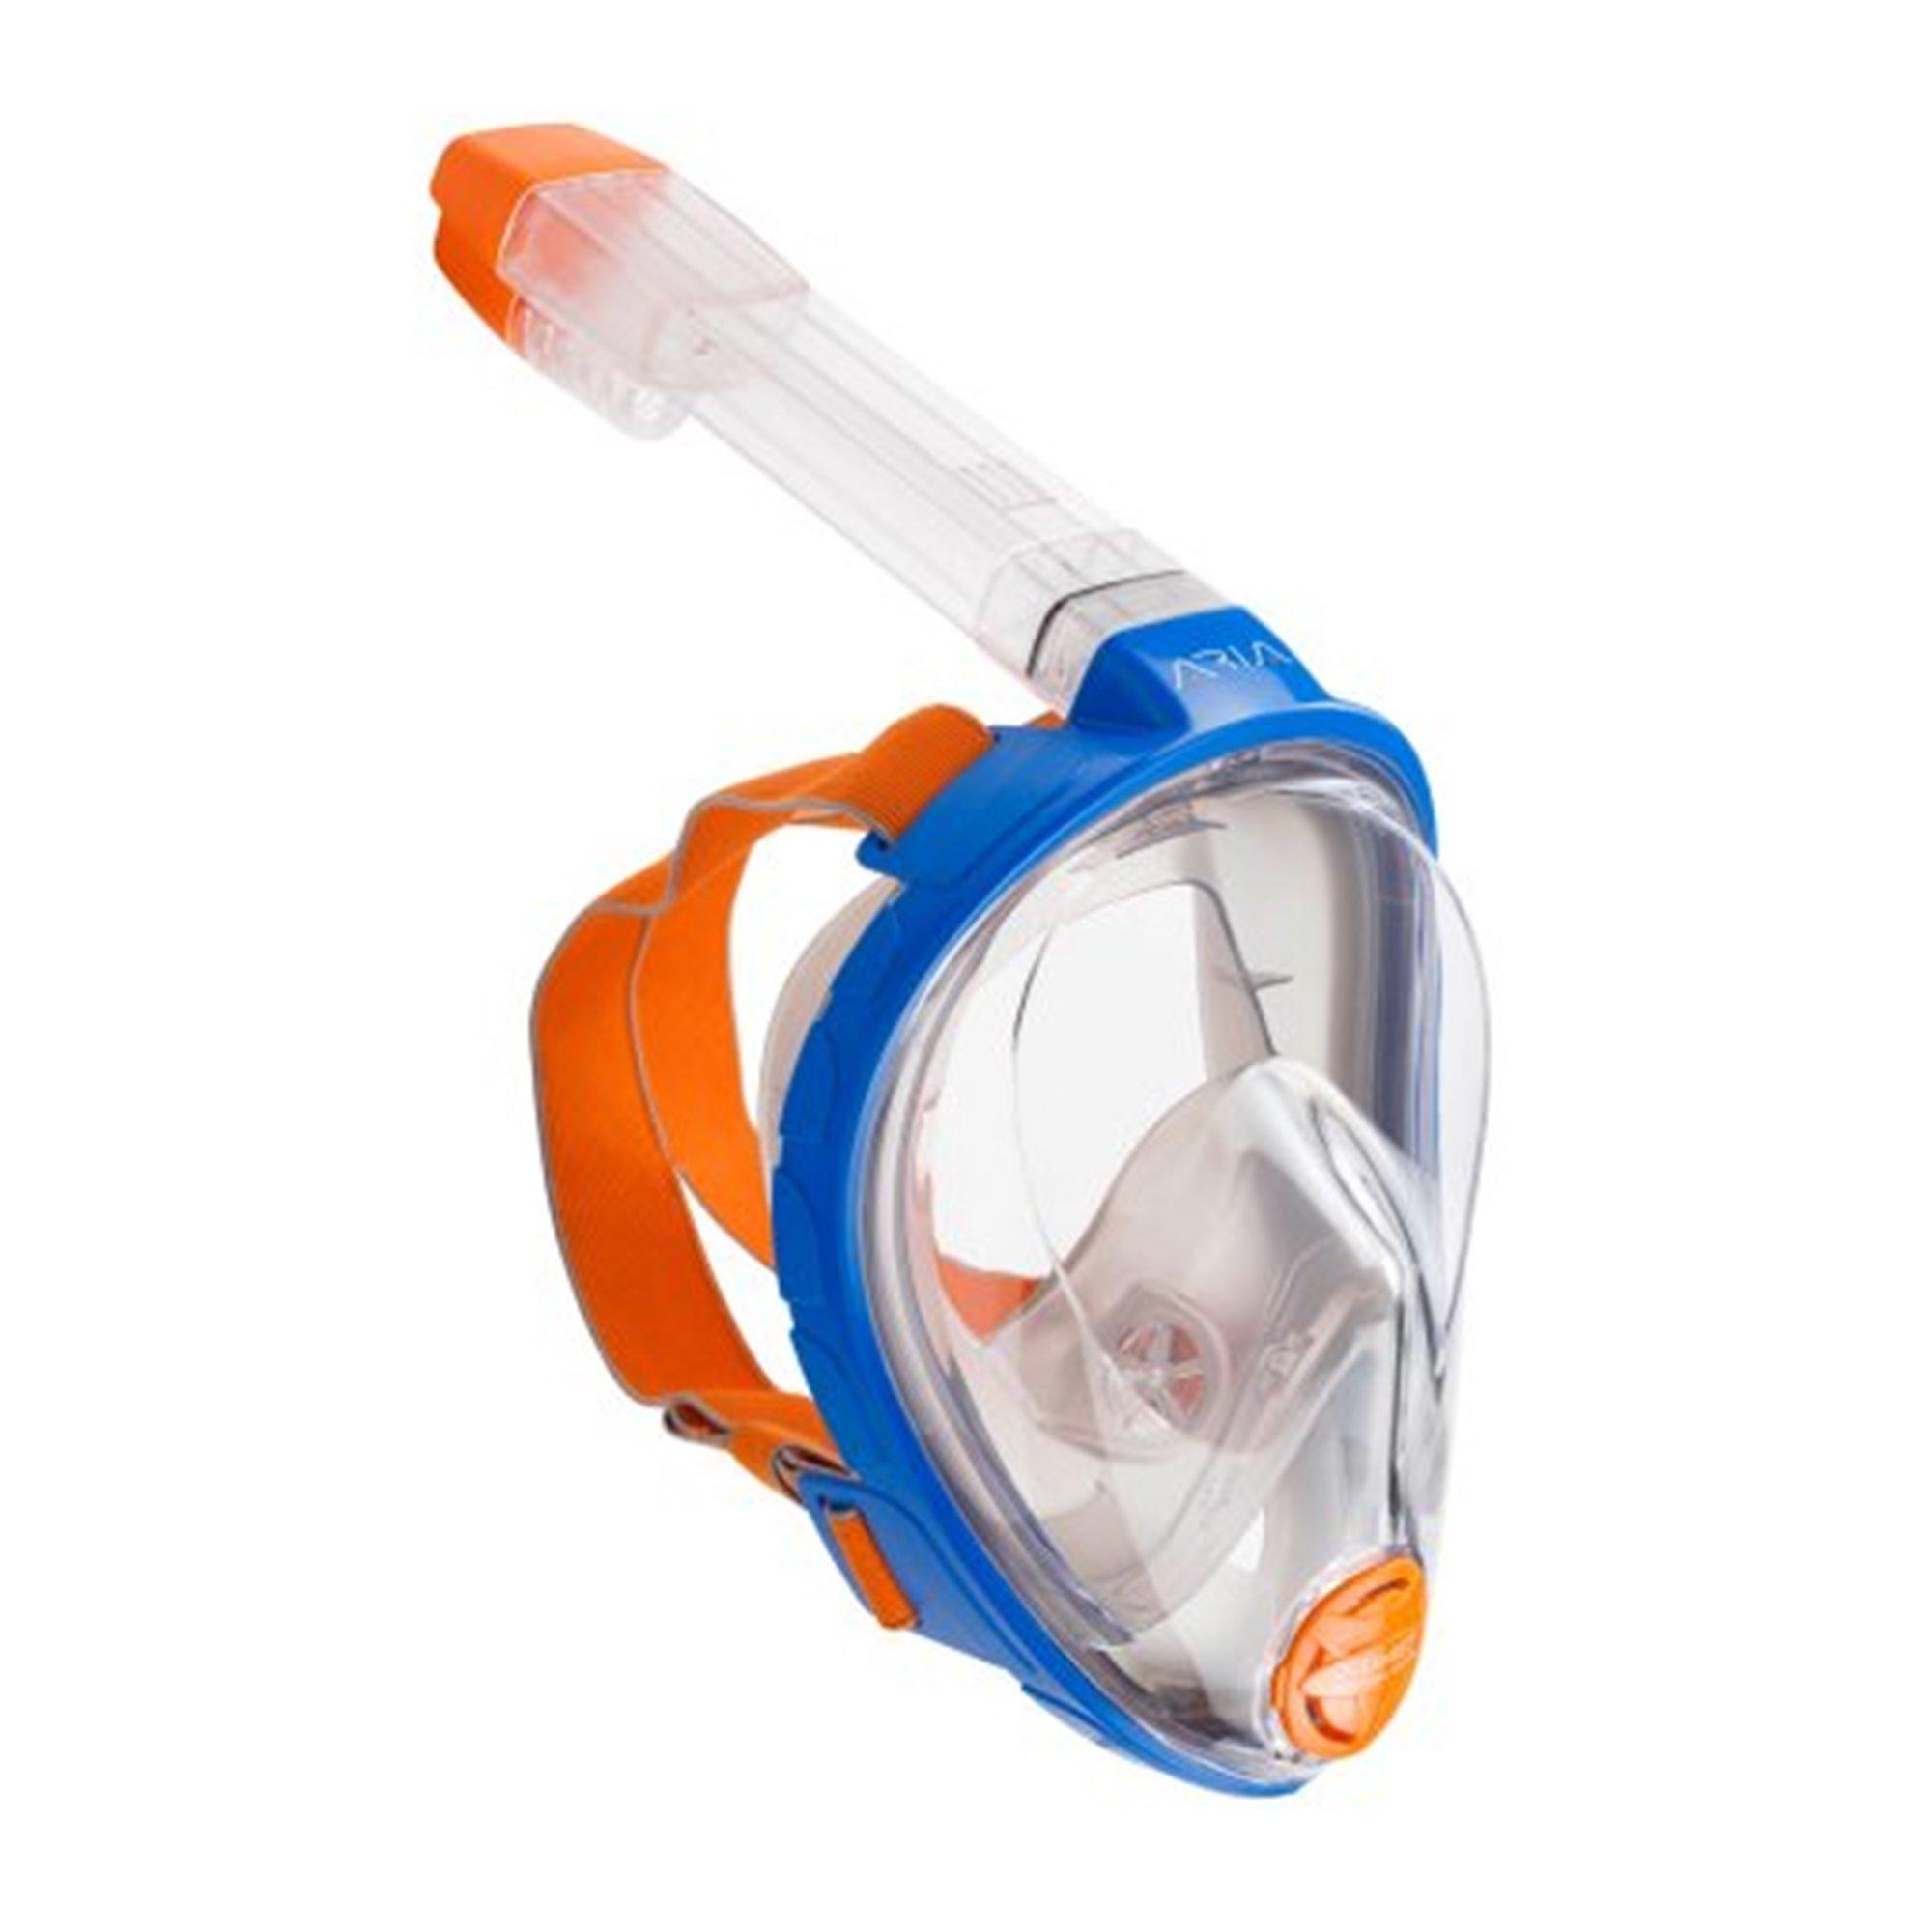 Ocean Reef Aria Full Face Snorkeling Mask